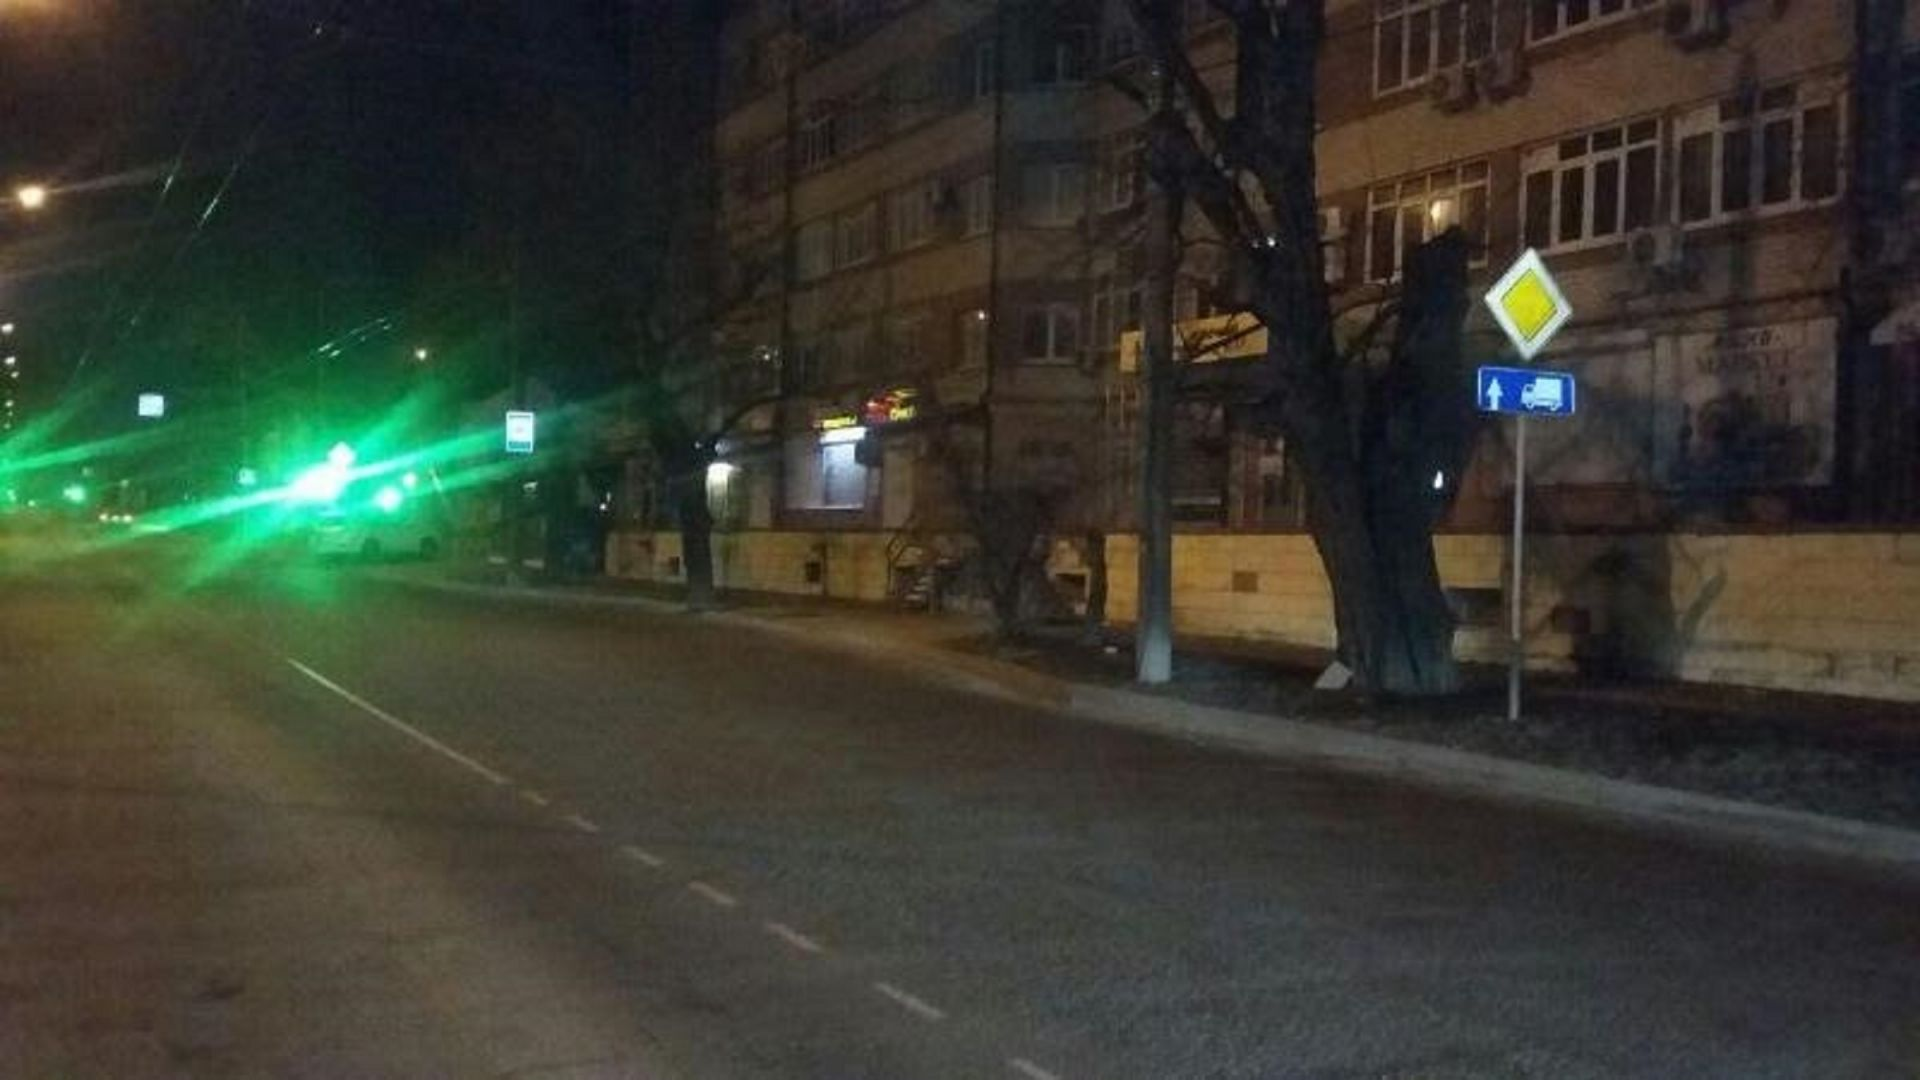 ВСтаврополе шофёр сбил пенсионерку и исчез сместа происшествия